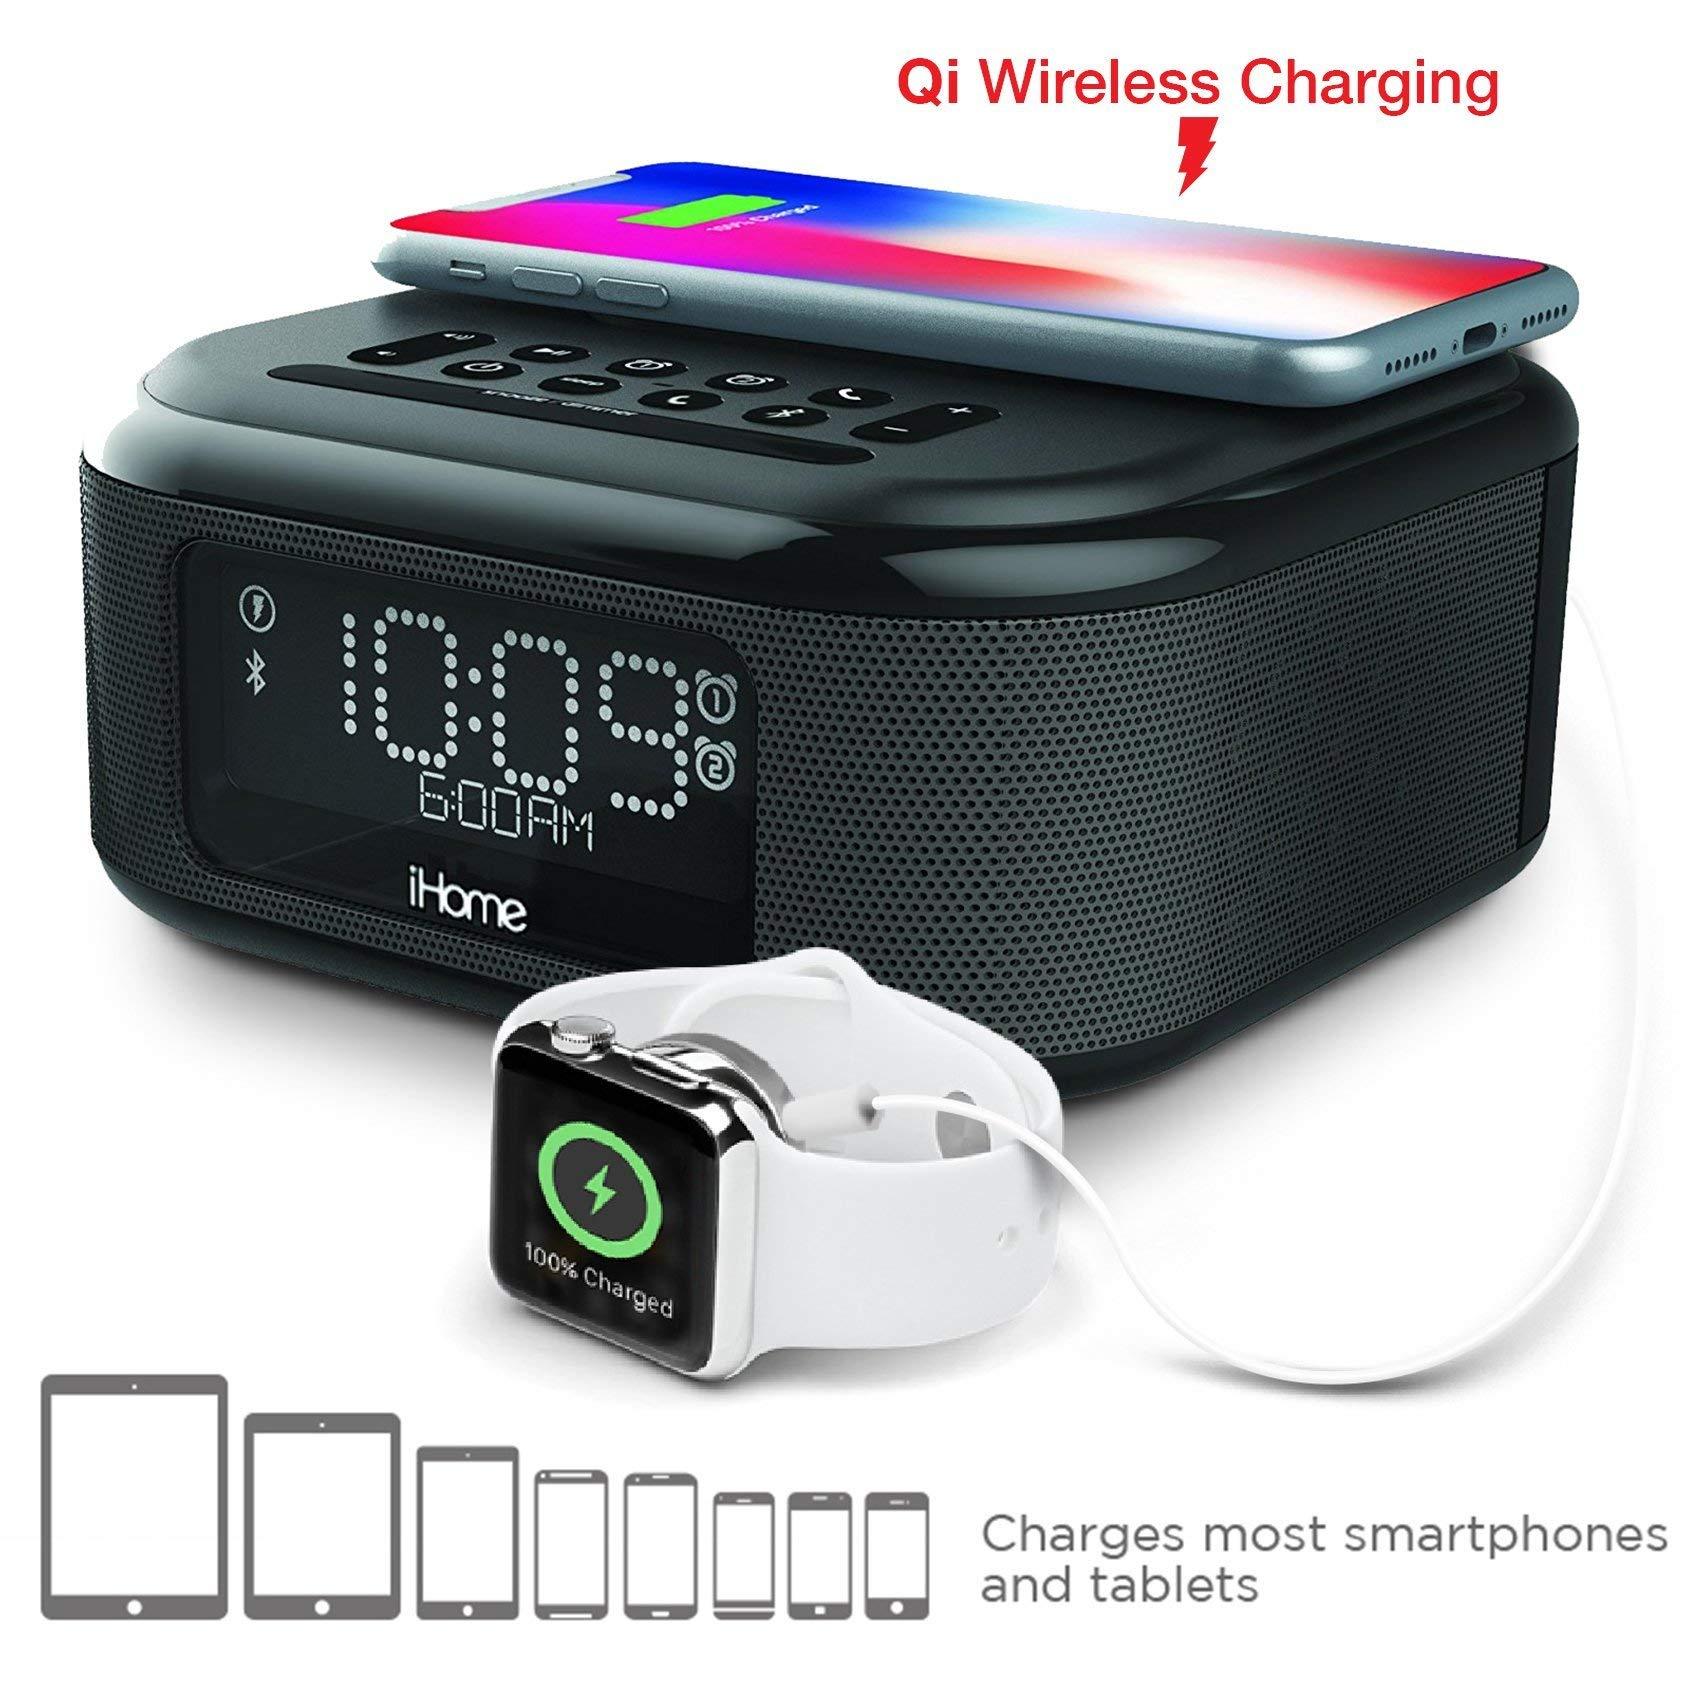 iHome iBTW23 Wireless Charging Bluetooth Alarm Clock with Speakerphone USB Charging Port For iPhone X 8/8Plus More (Renewed)